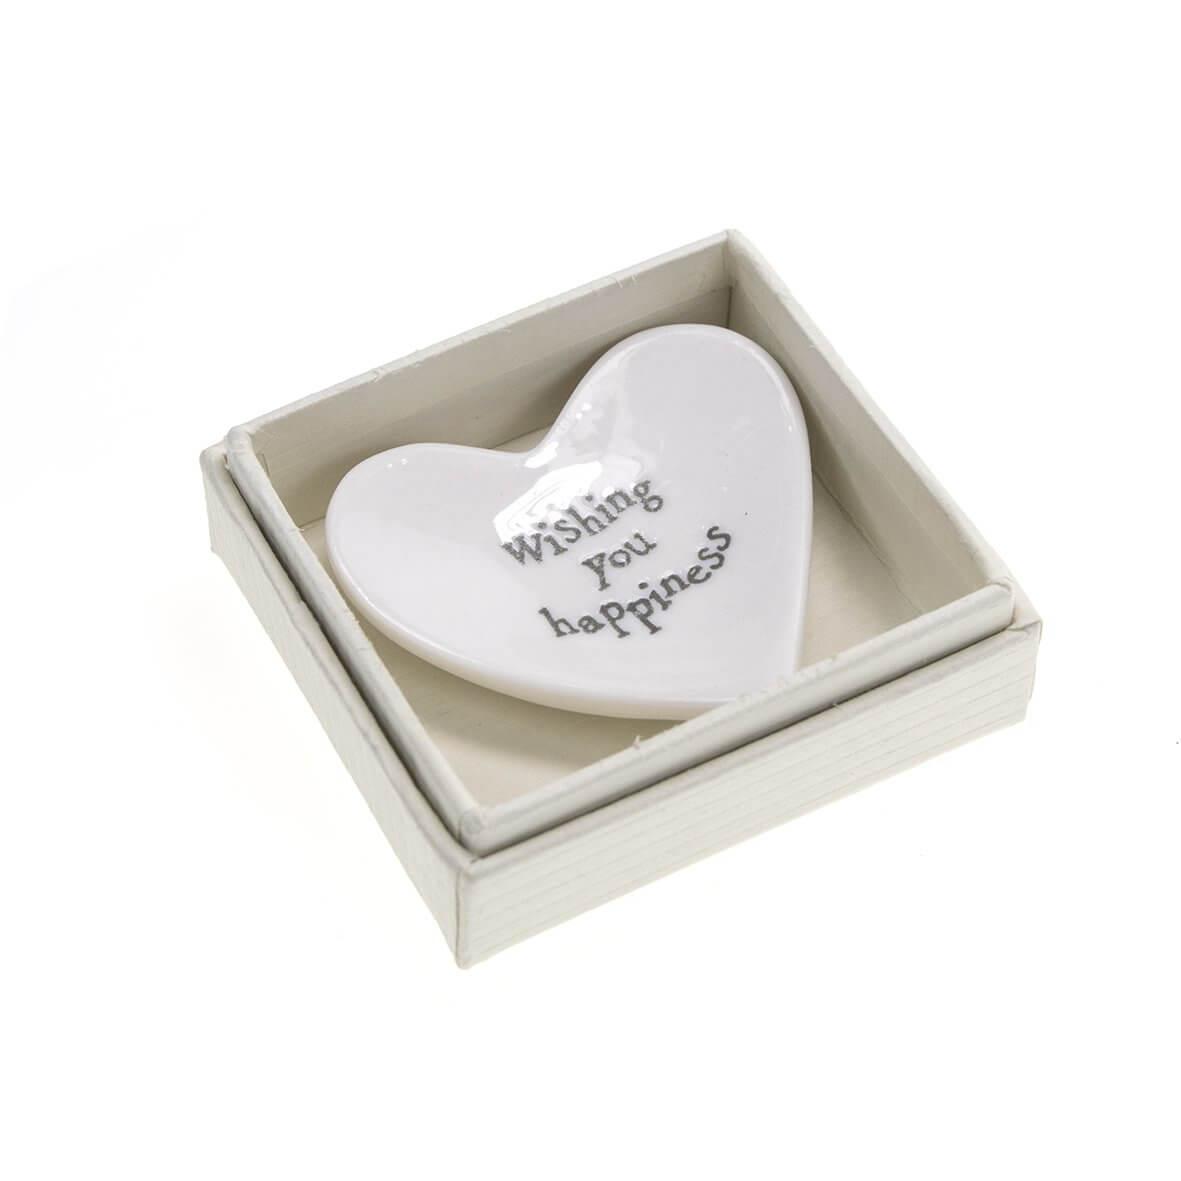 Boxed Mini Heart Wishing You Happiness